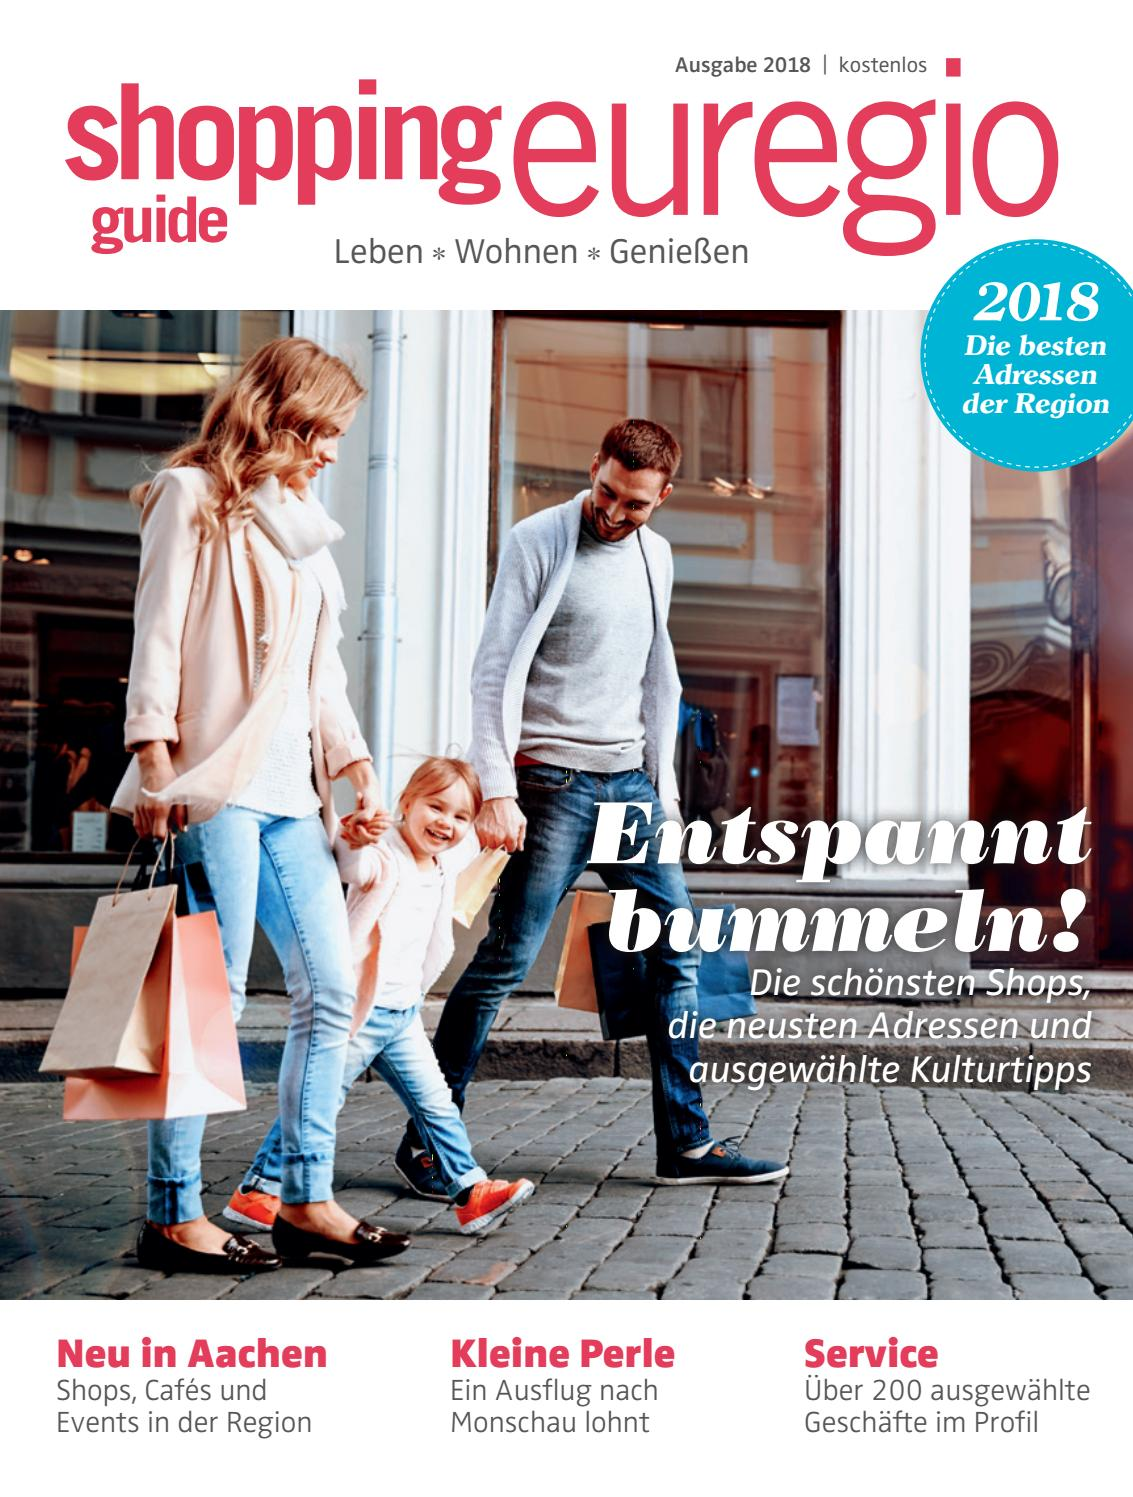 ShoppingGuide Euregio 2018 by print'n'press Verlag issuu